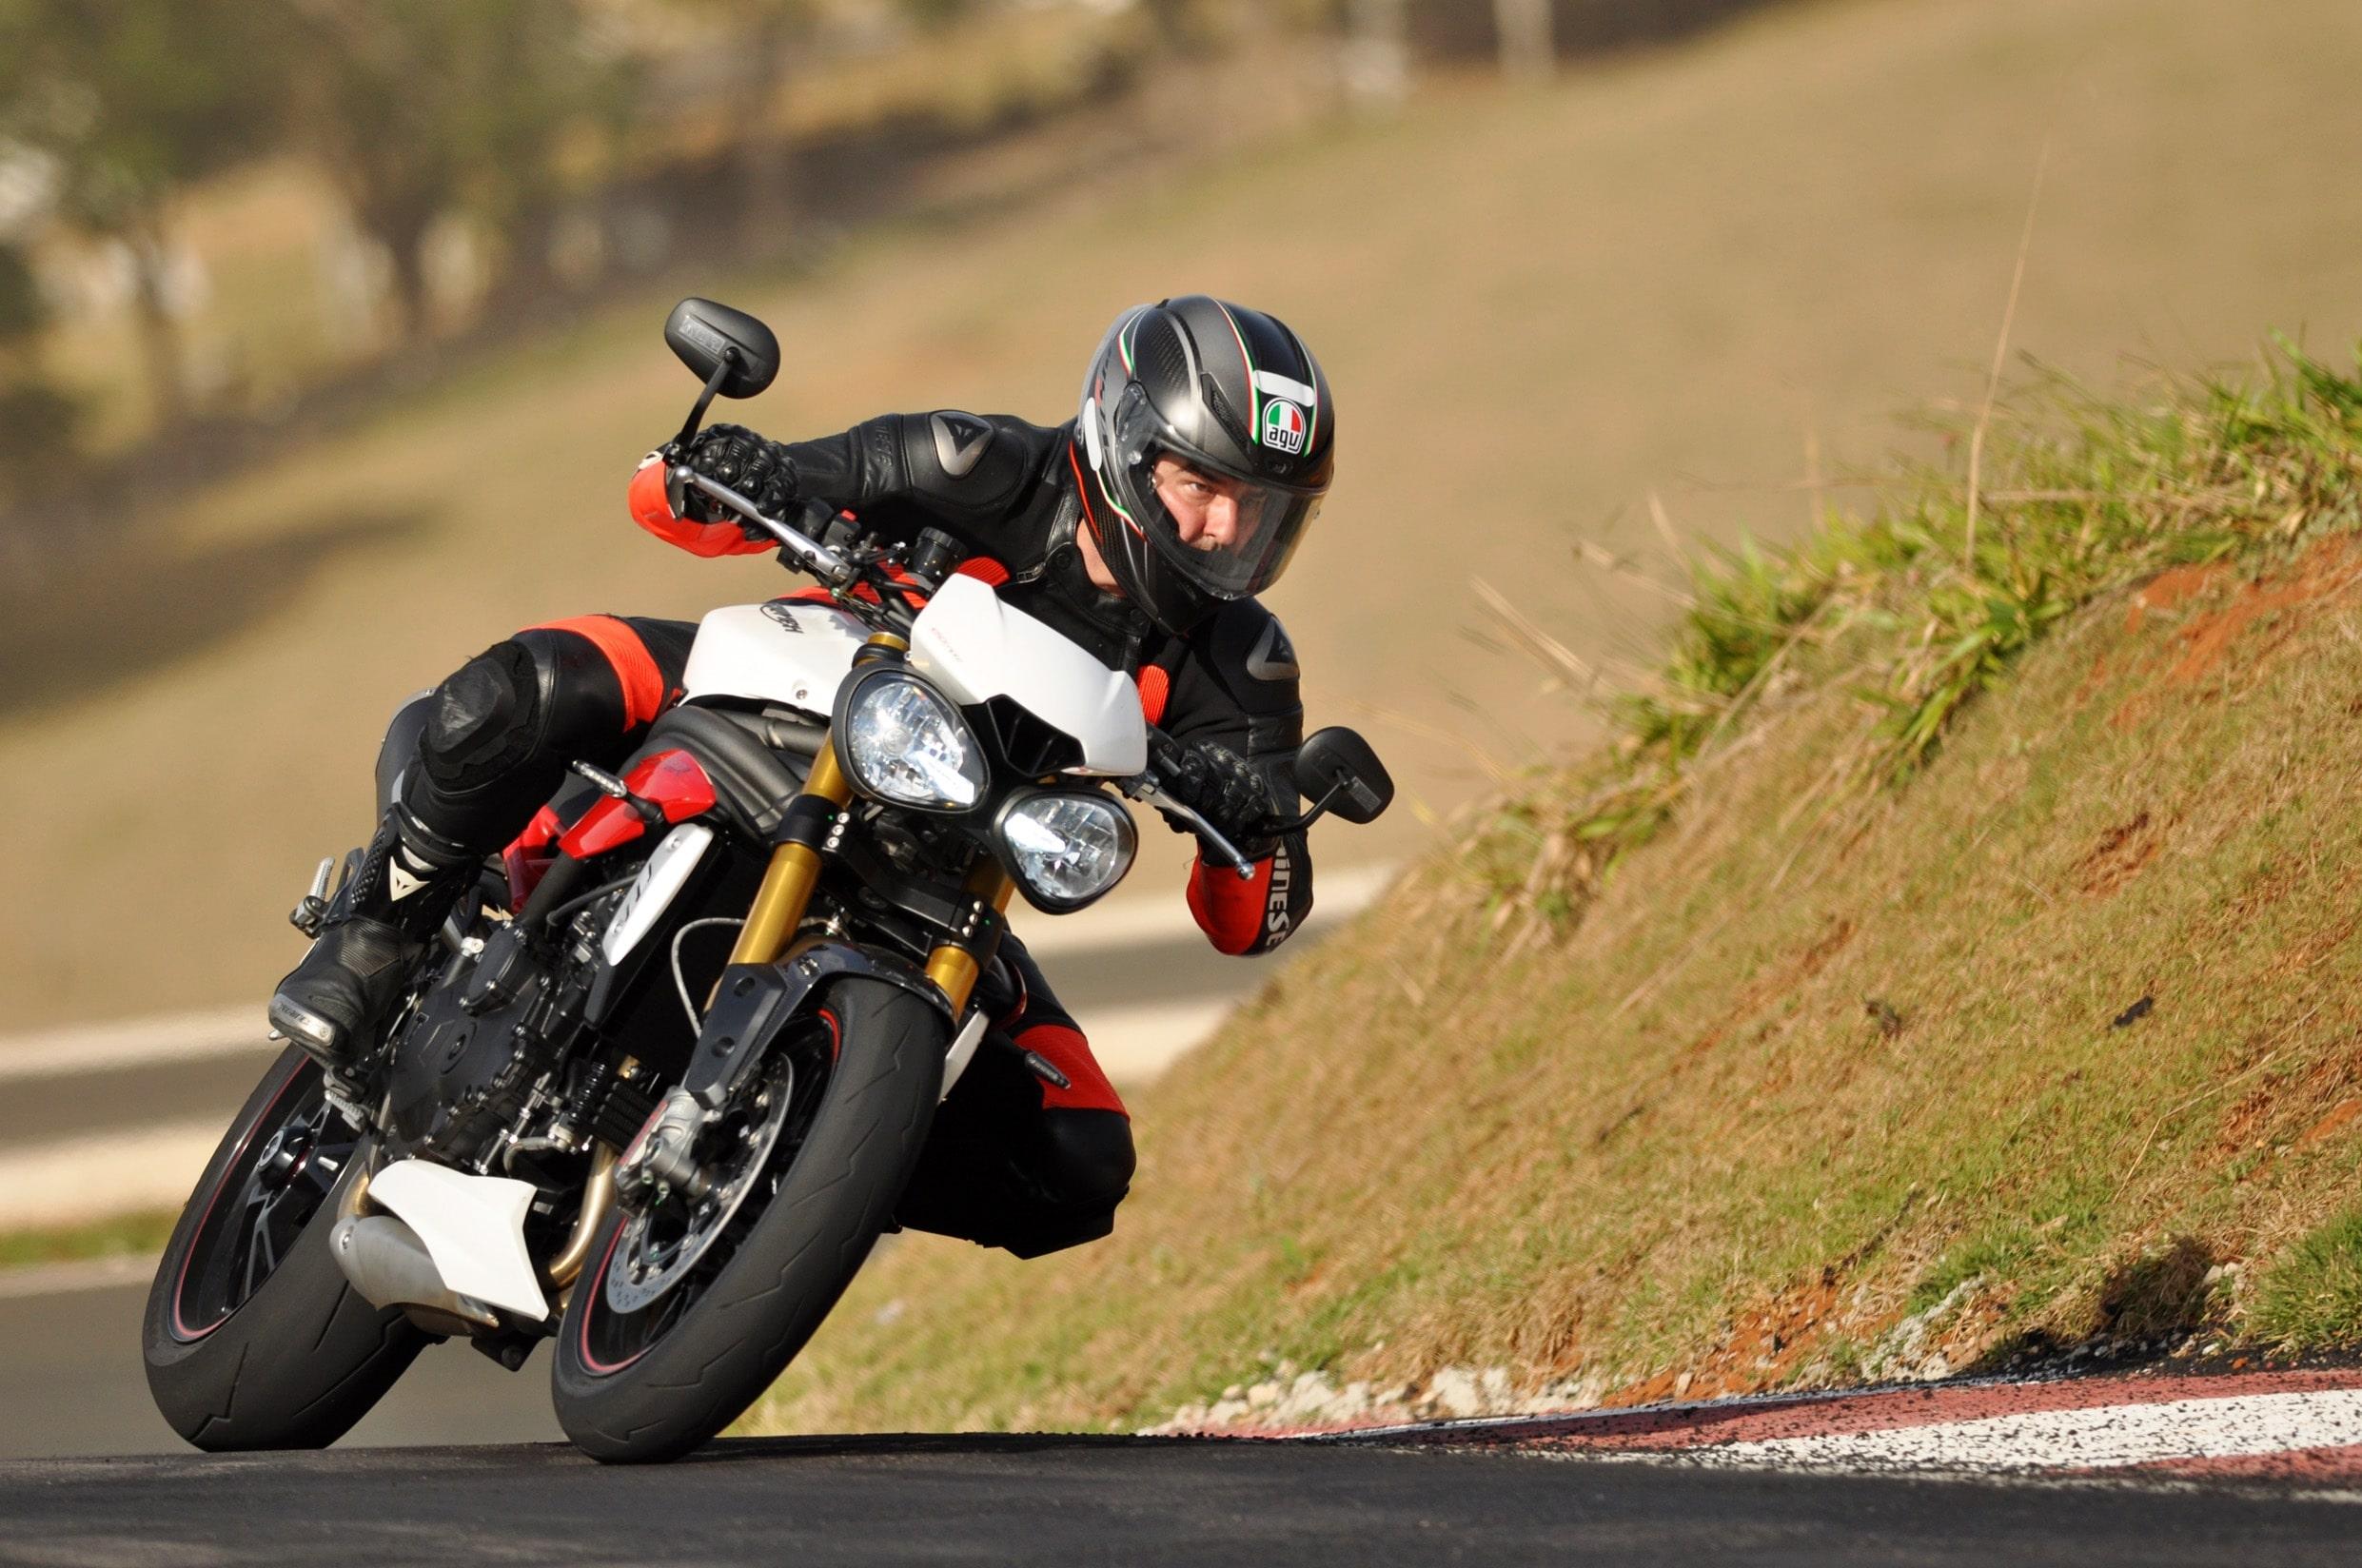 Triumph Speed Tripler